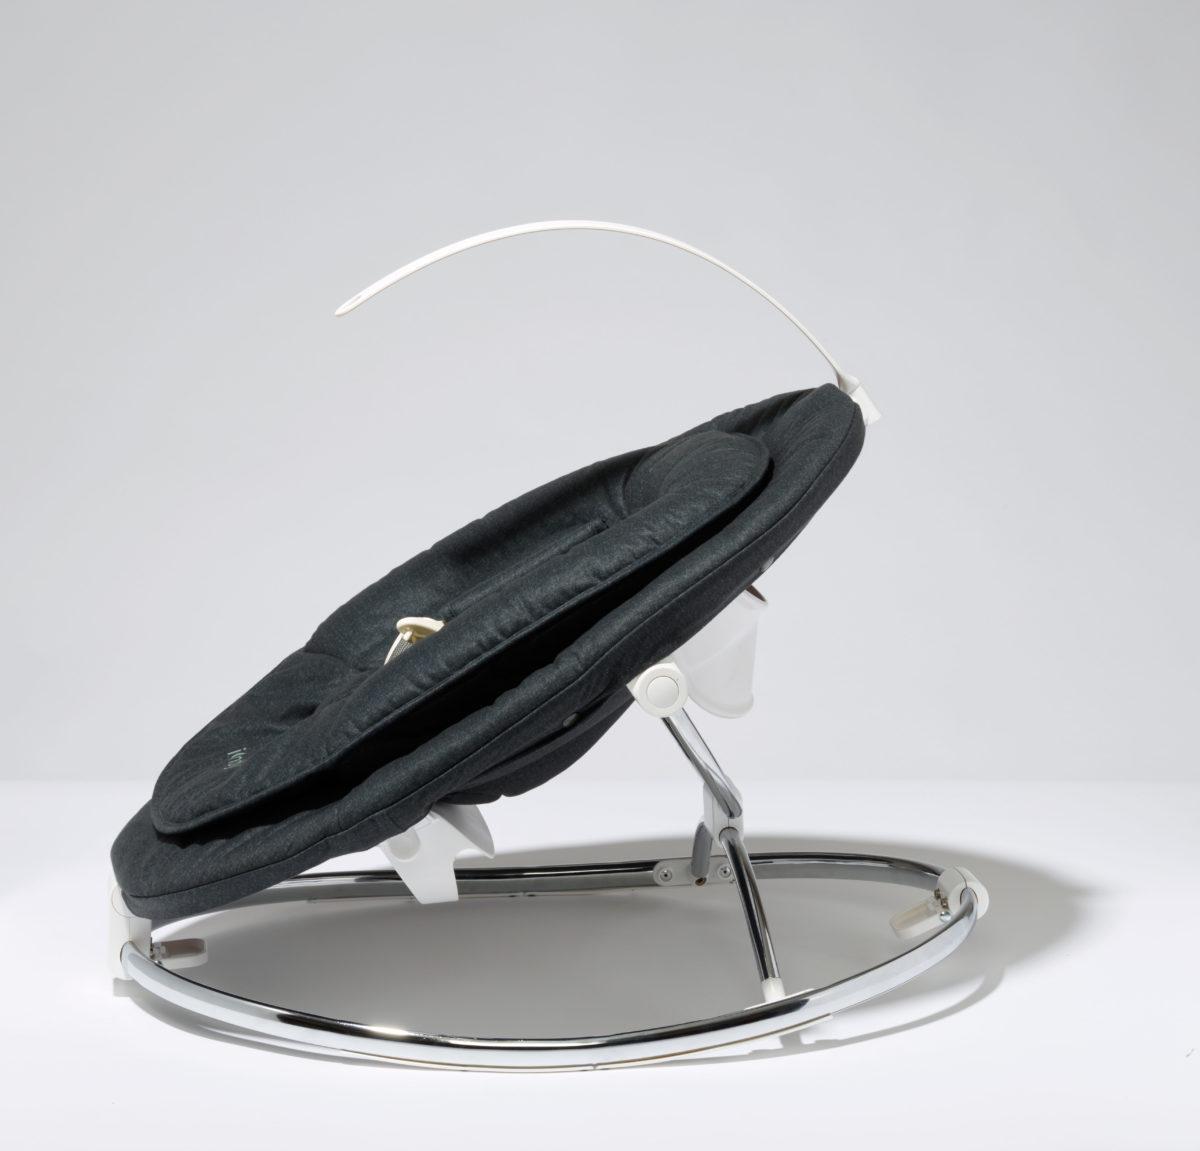 iCandy-Mi-Chair-new-born-pod-rocker-side-view-toy-hanger-jpg